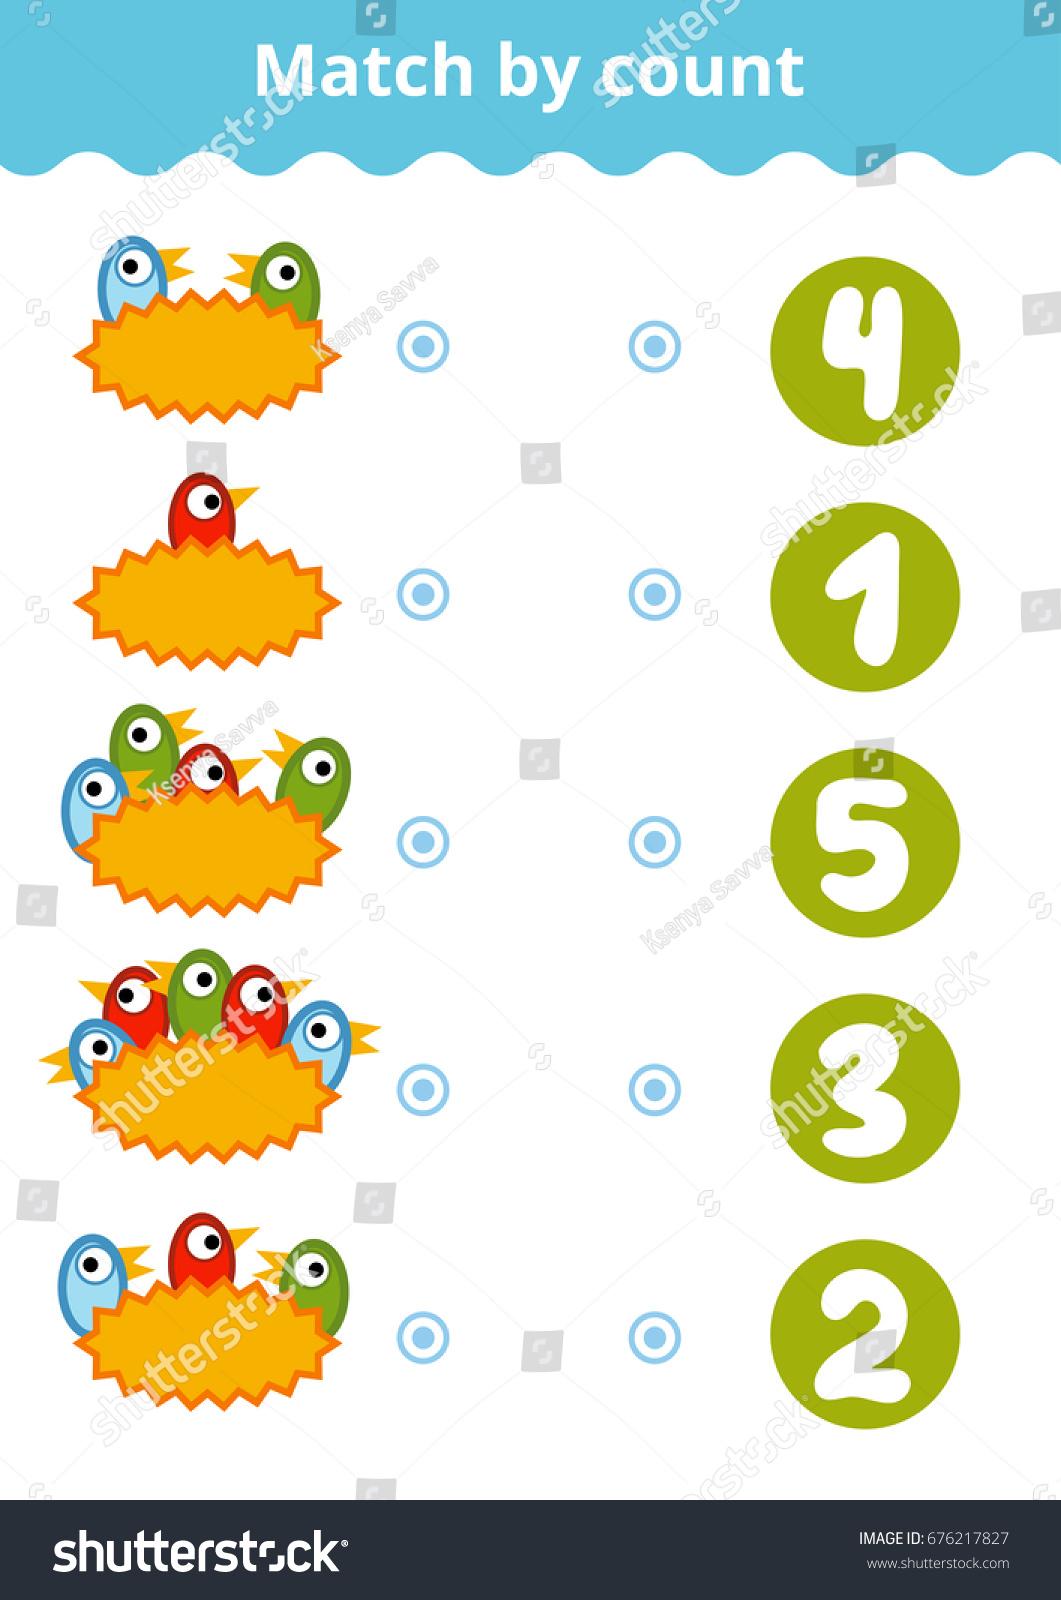 Counting Game Preschool Children Educational Mathematical